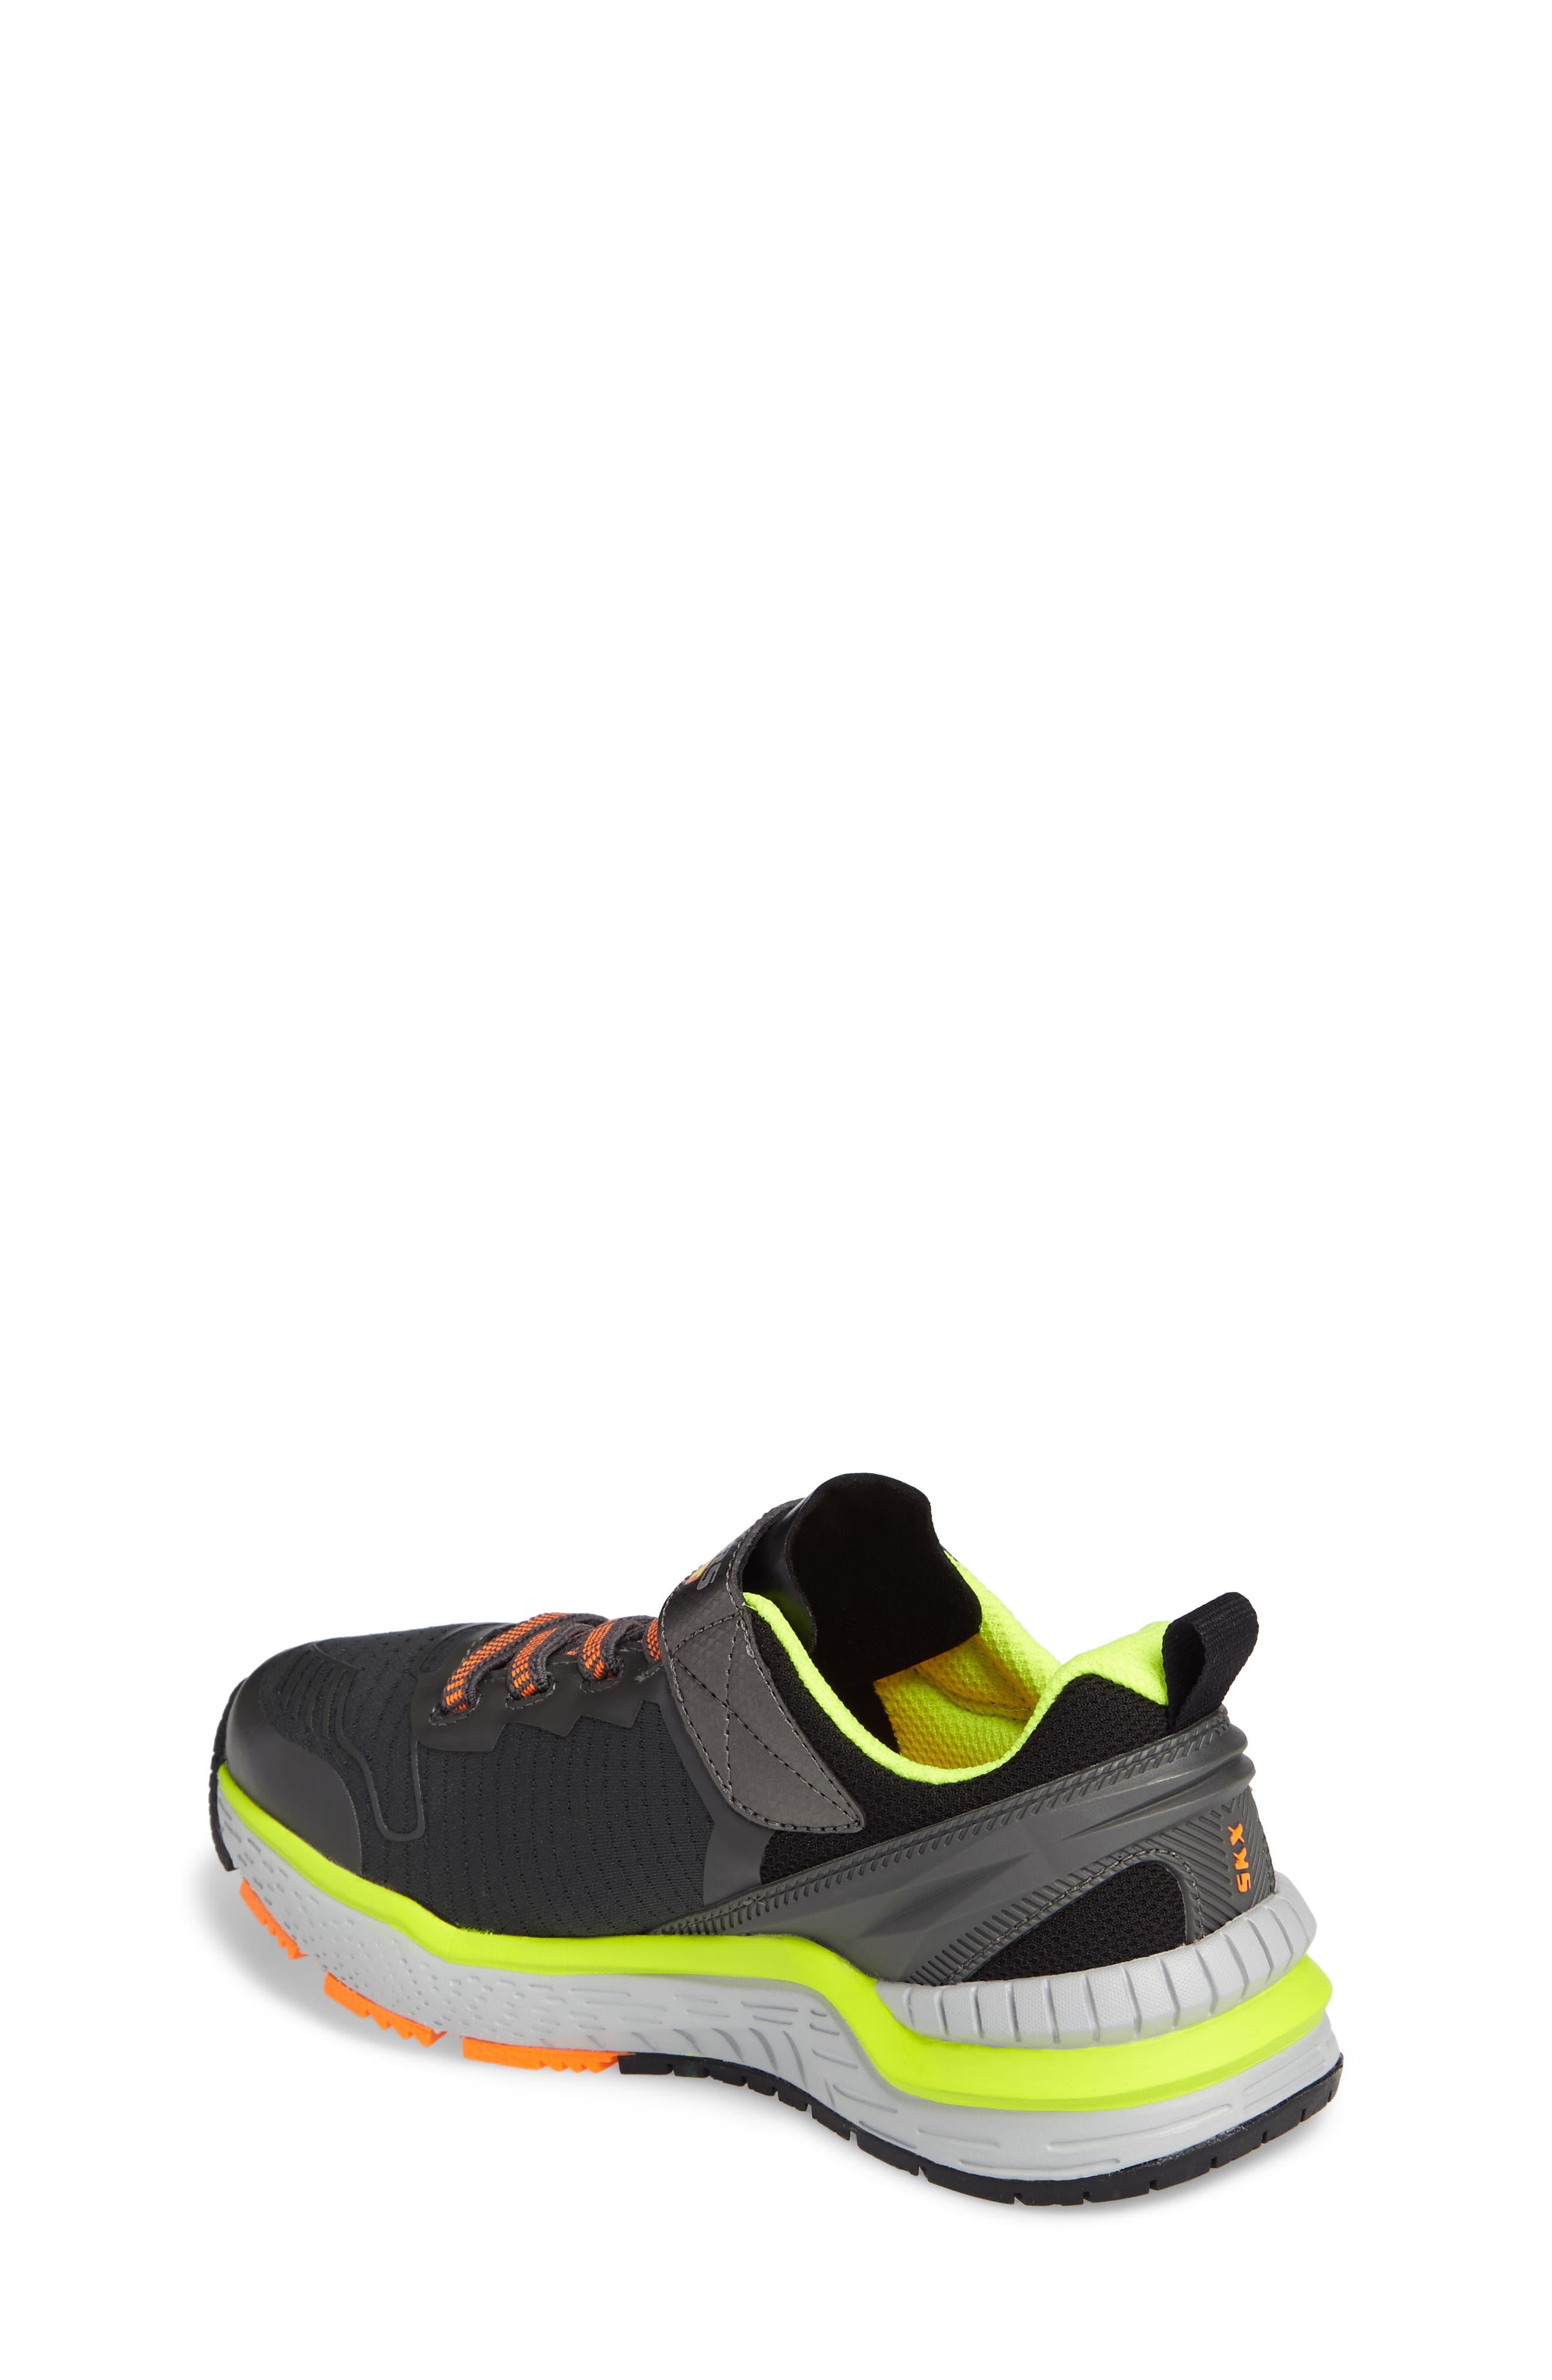 Hyperjolt Sneaker,                             Alternate thumbnail 2, color,                             Charcoal/ Black/ Lime